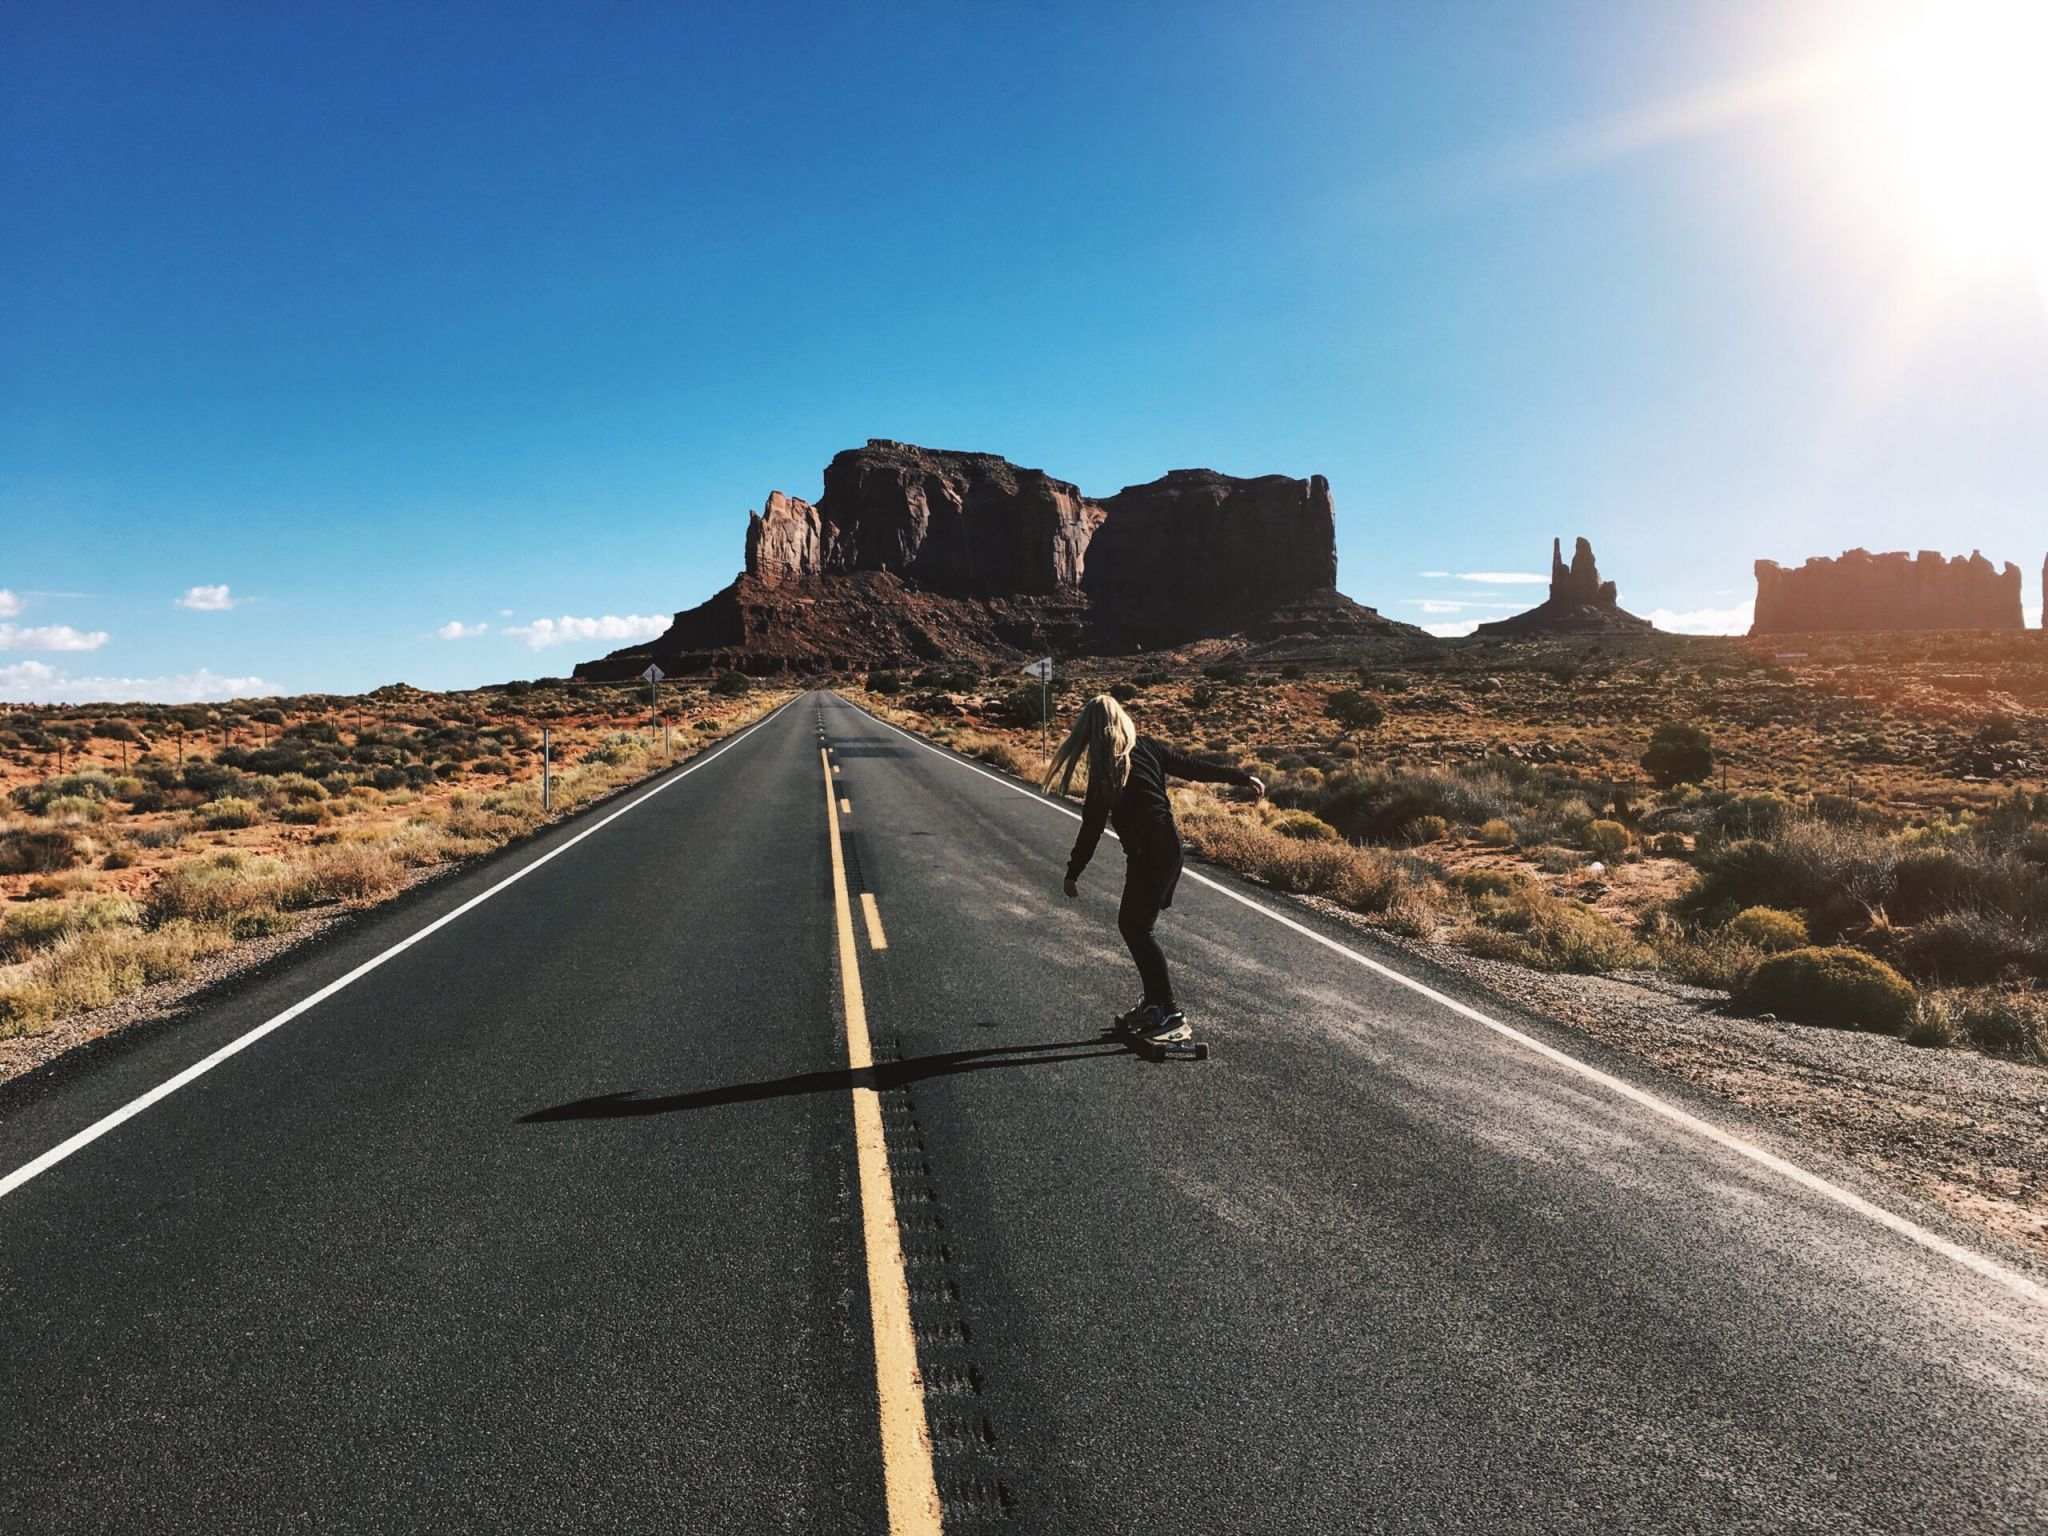 man in black jacket and black pants running on gray asphalt road during daytime